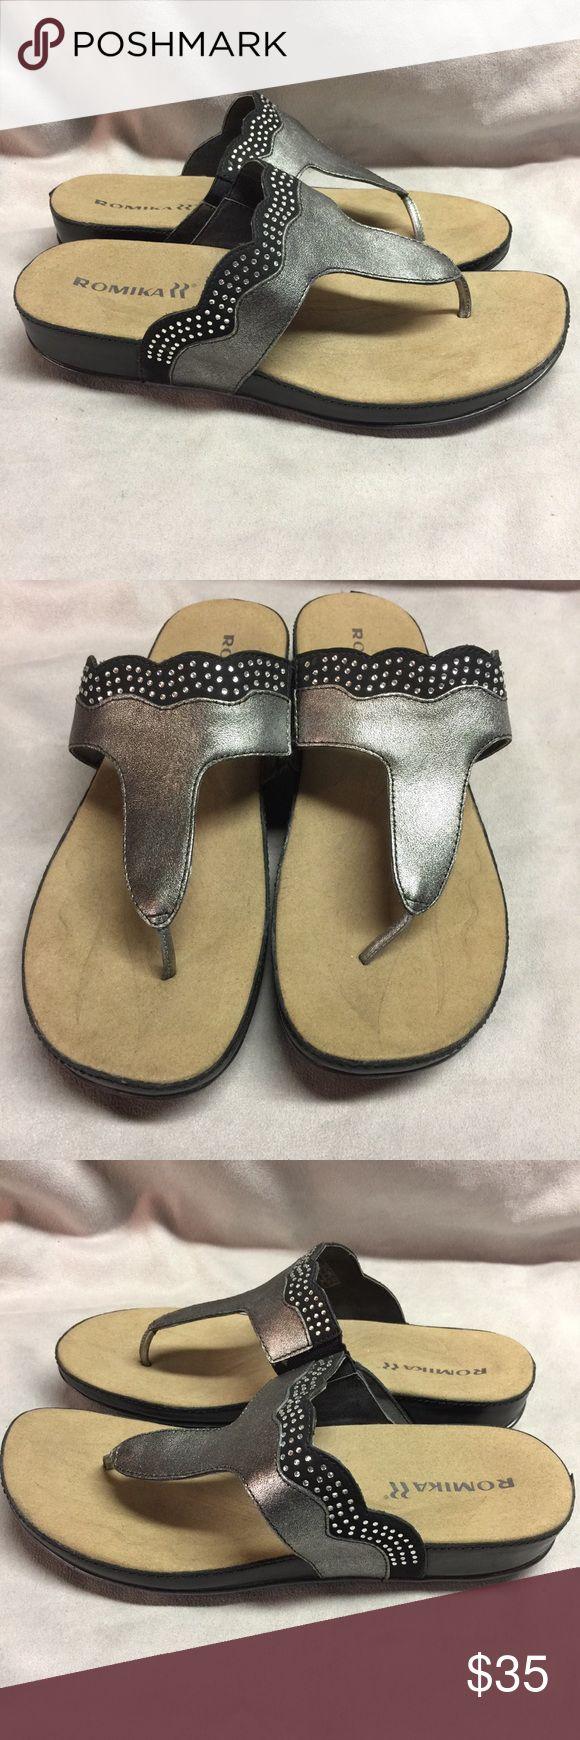 Romika Womens Fidschi 44 Sandal Anthrazit Black Romika Womens Fidschi 44 Dress Sandal Anthrazit Black Size 41 EU 10-10.5 Med  Great condition Romika Shoes Sandals